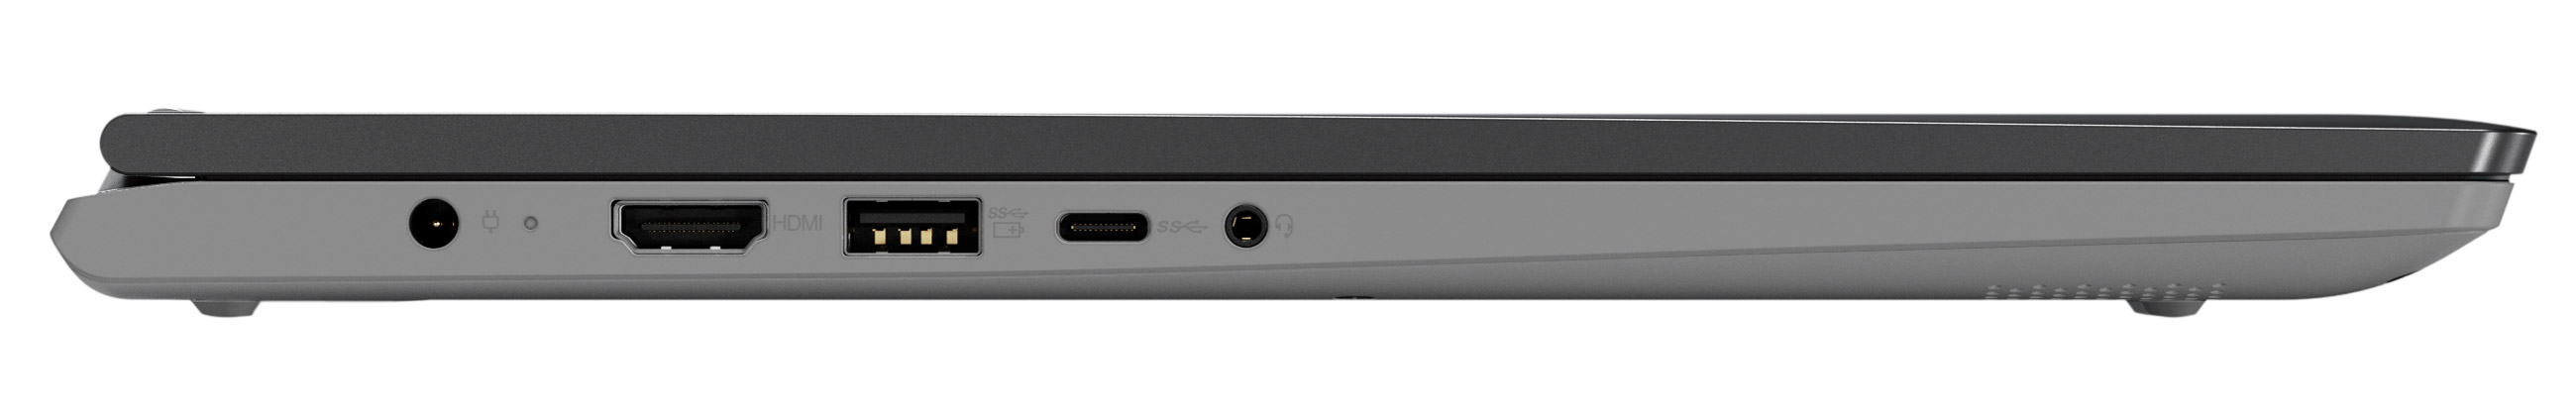 Фото  Ультрабук Lenovo Yoga 530 Onyx Black (81EK00L7RA)